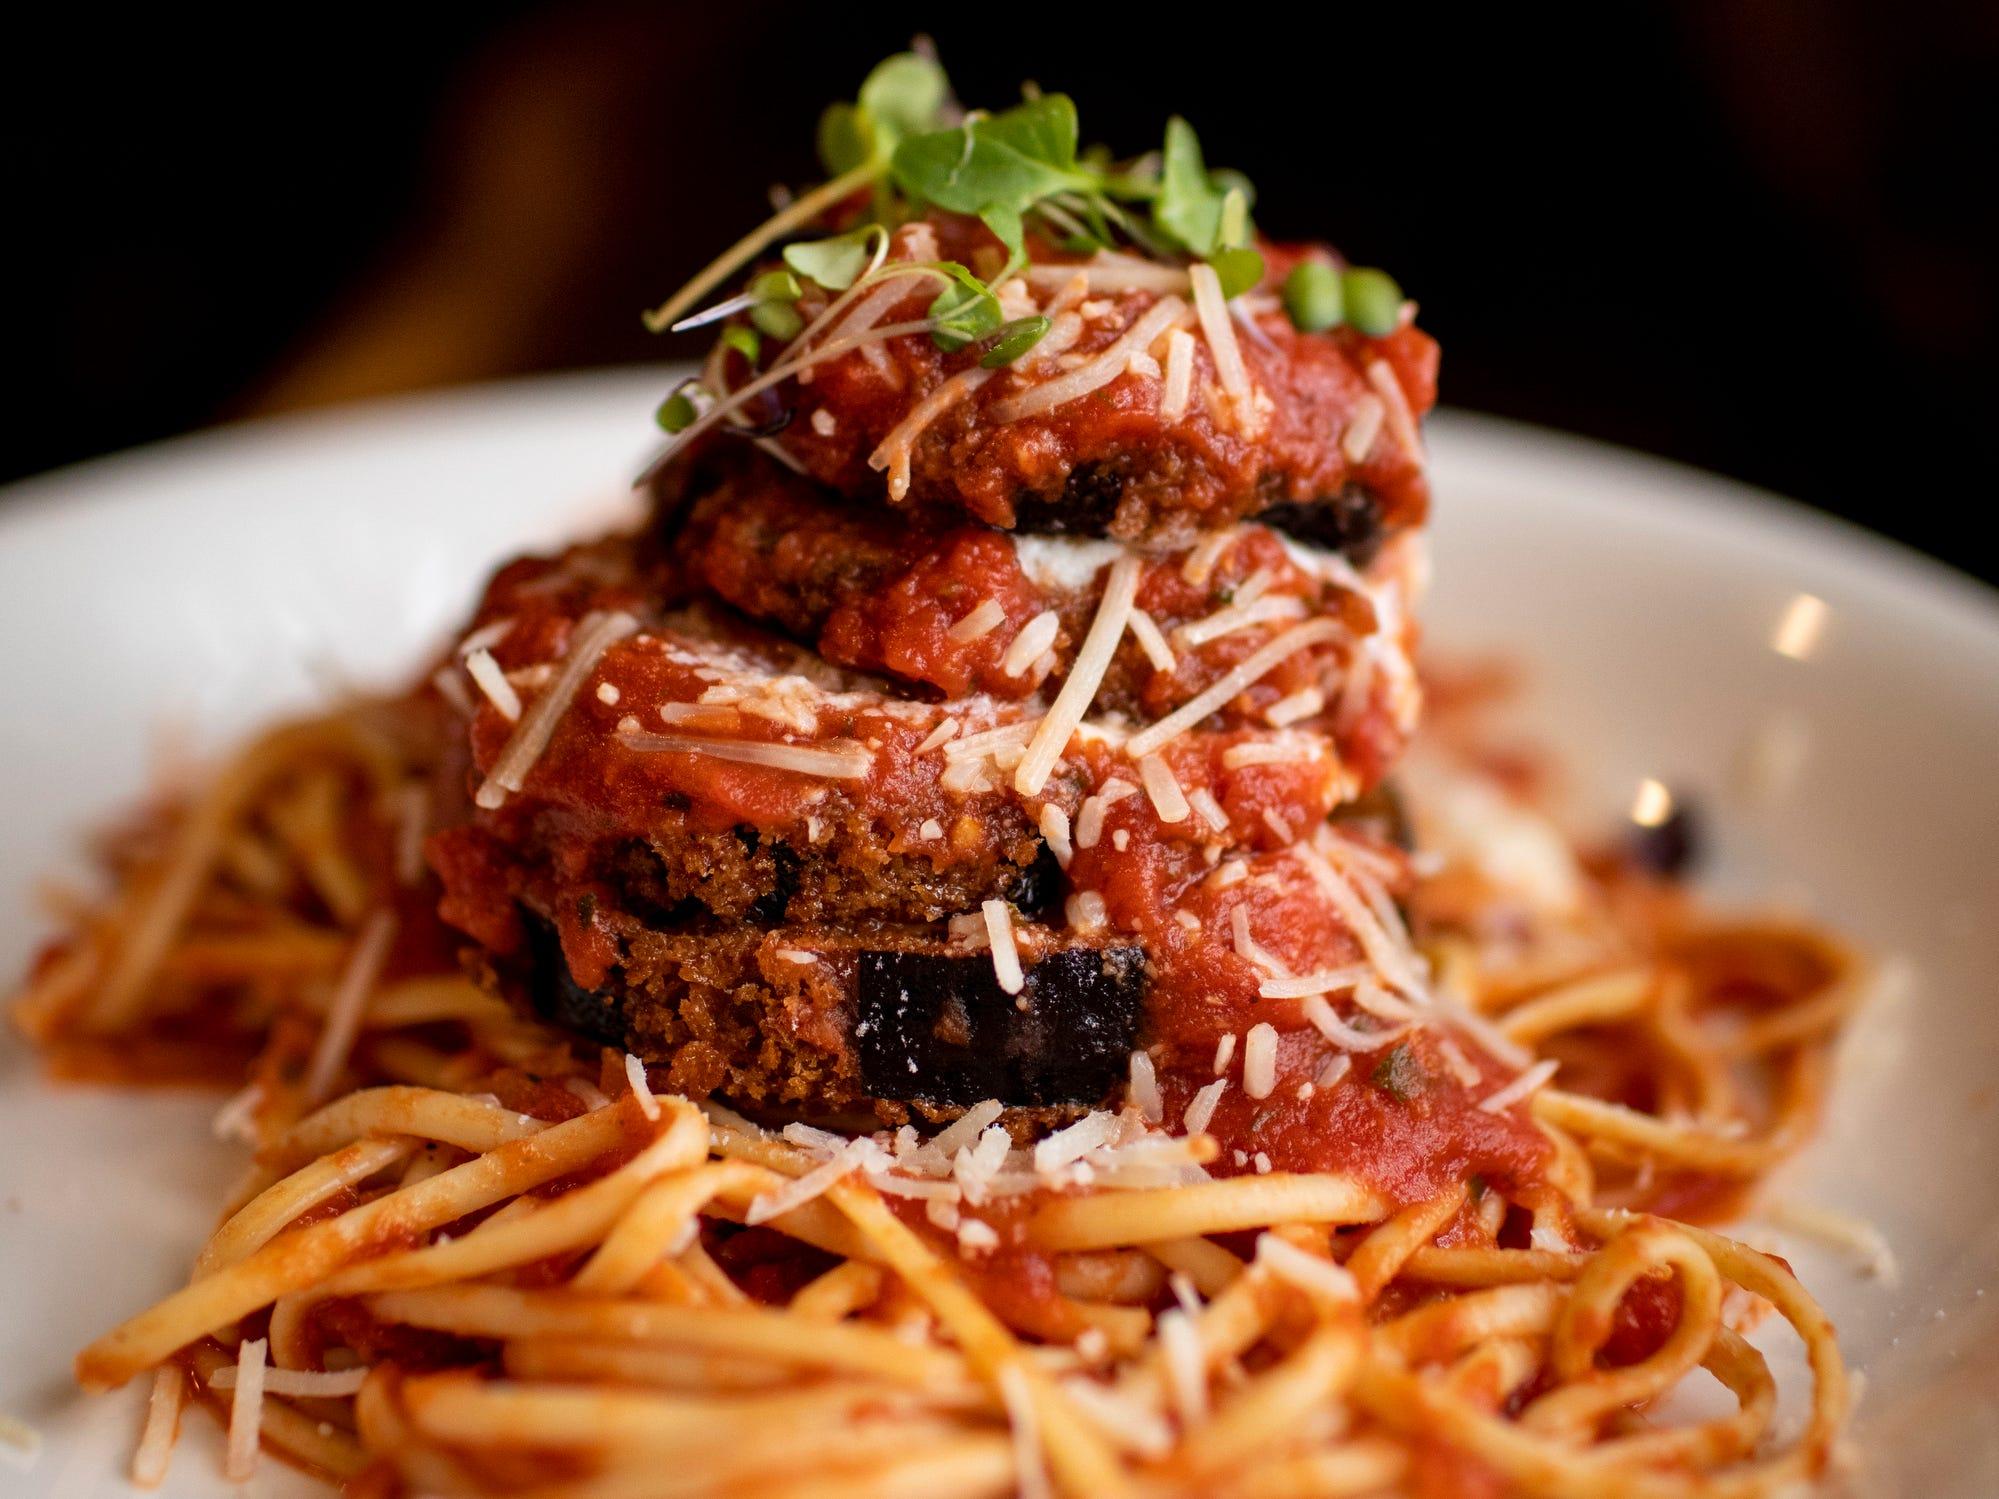 Sorrento's Italian Joint's eggplant parmesan is served atop al dente linguine and homemade marinara.